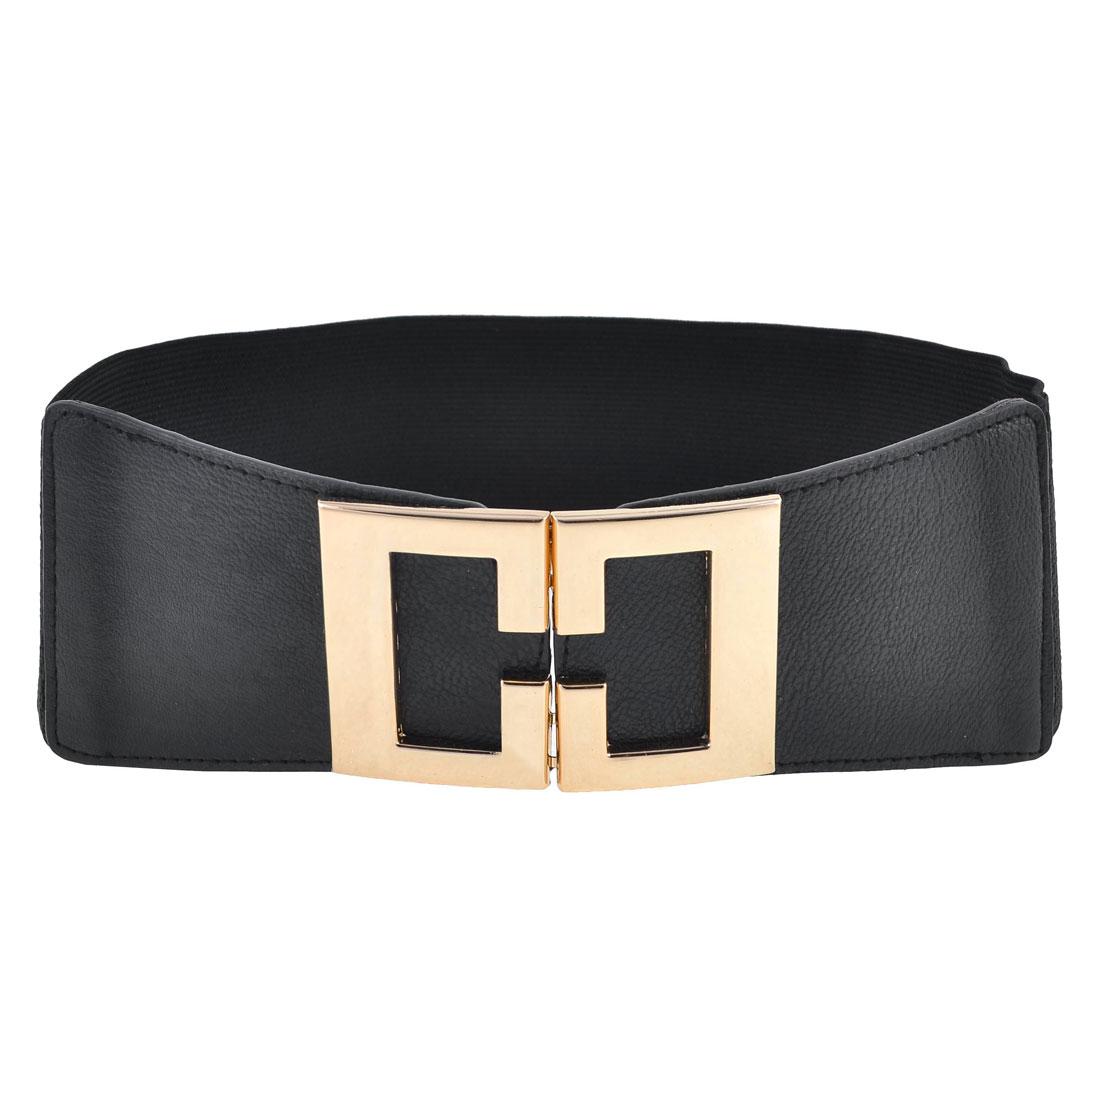 Woman Black Gold Tone Mirrored Interlocking Buckle Stretch Waistband Cinch Belt